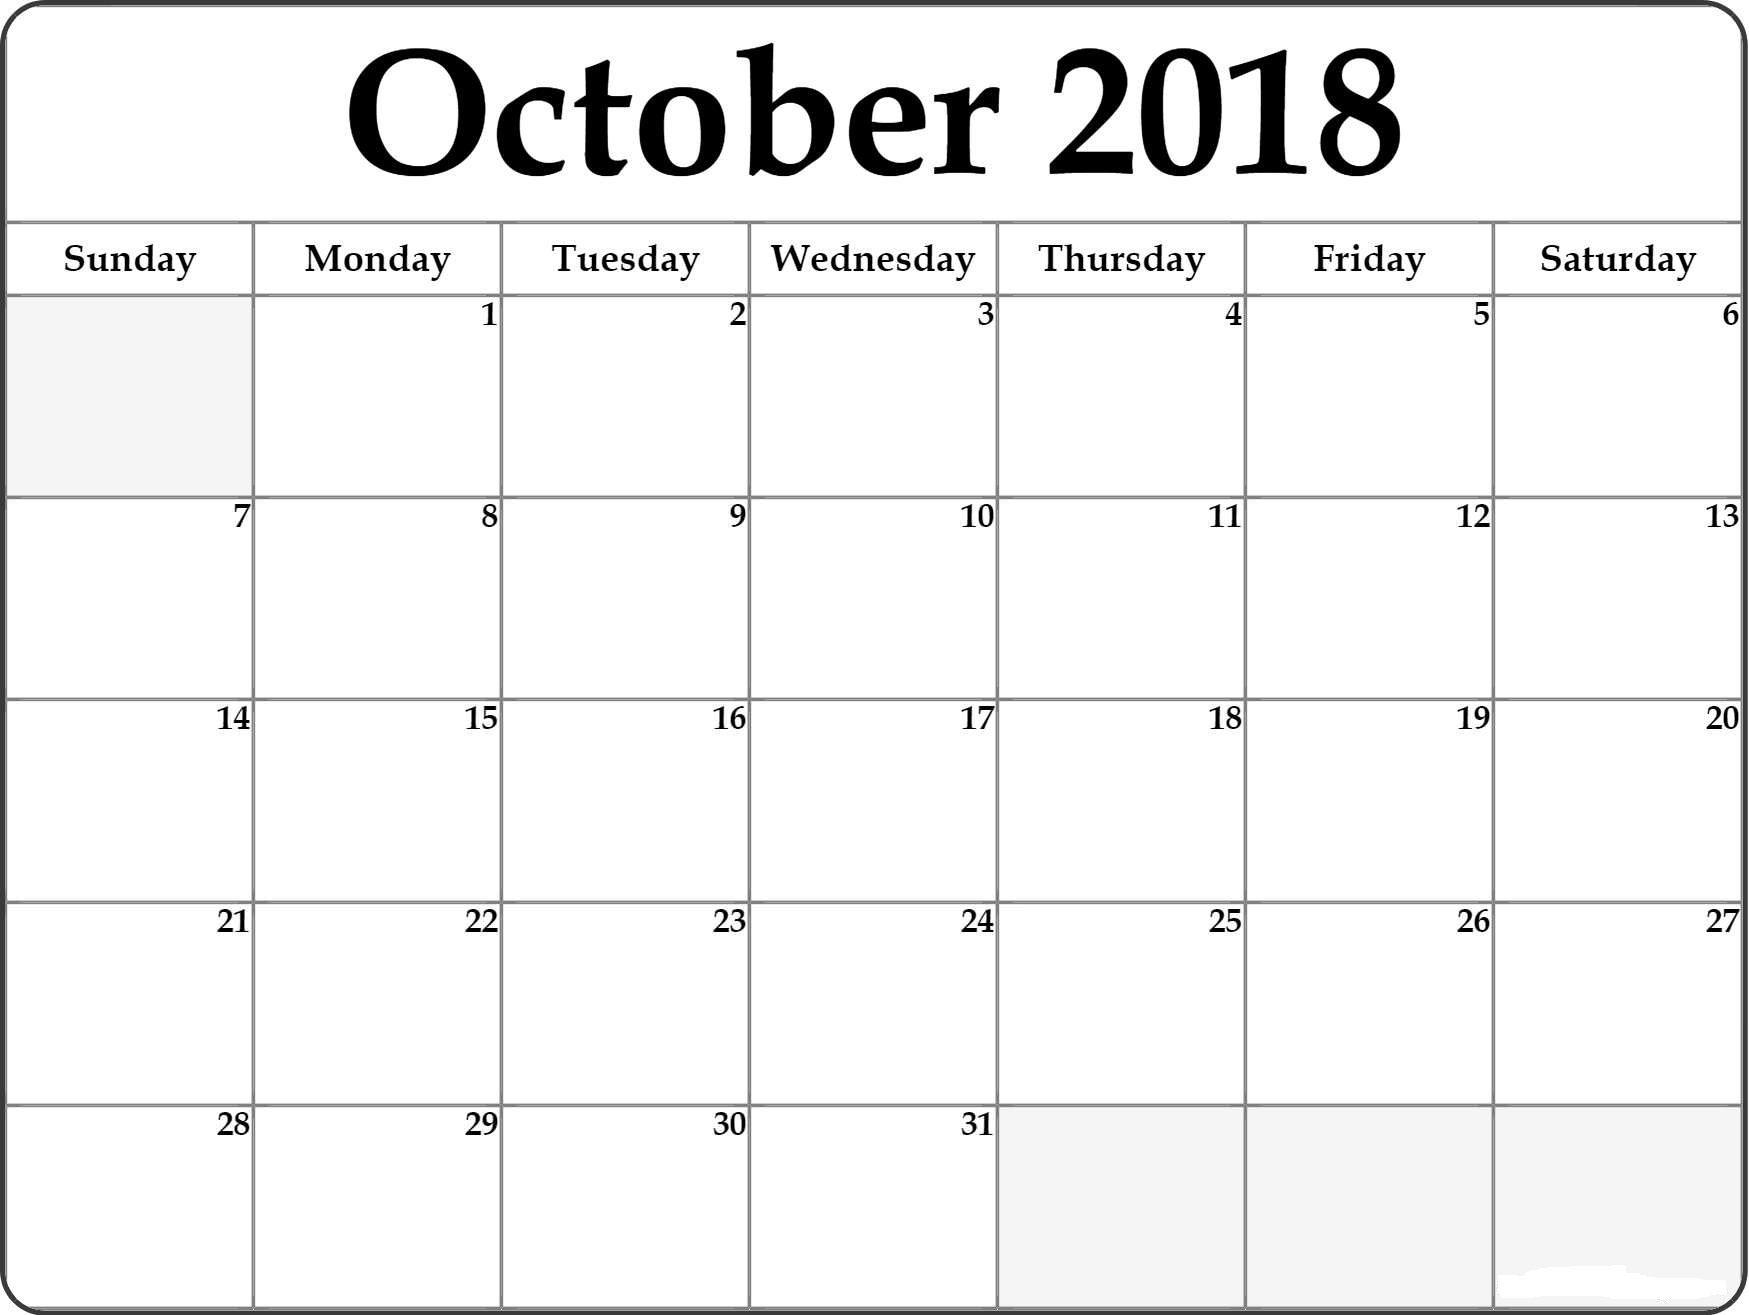 October 2018 Calendar Template Editable